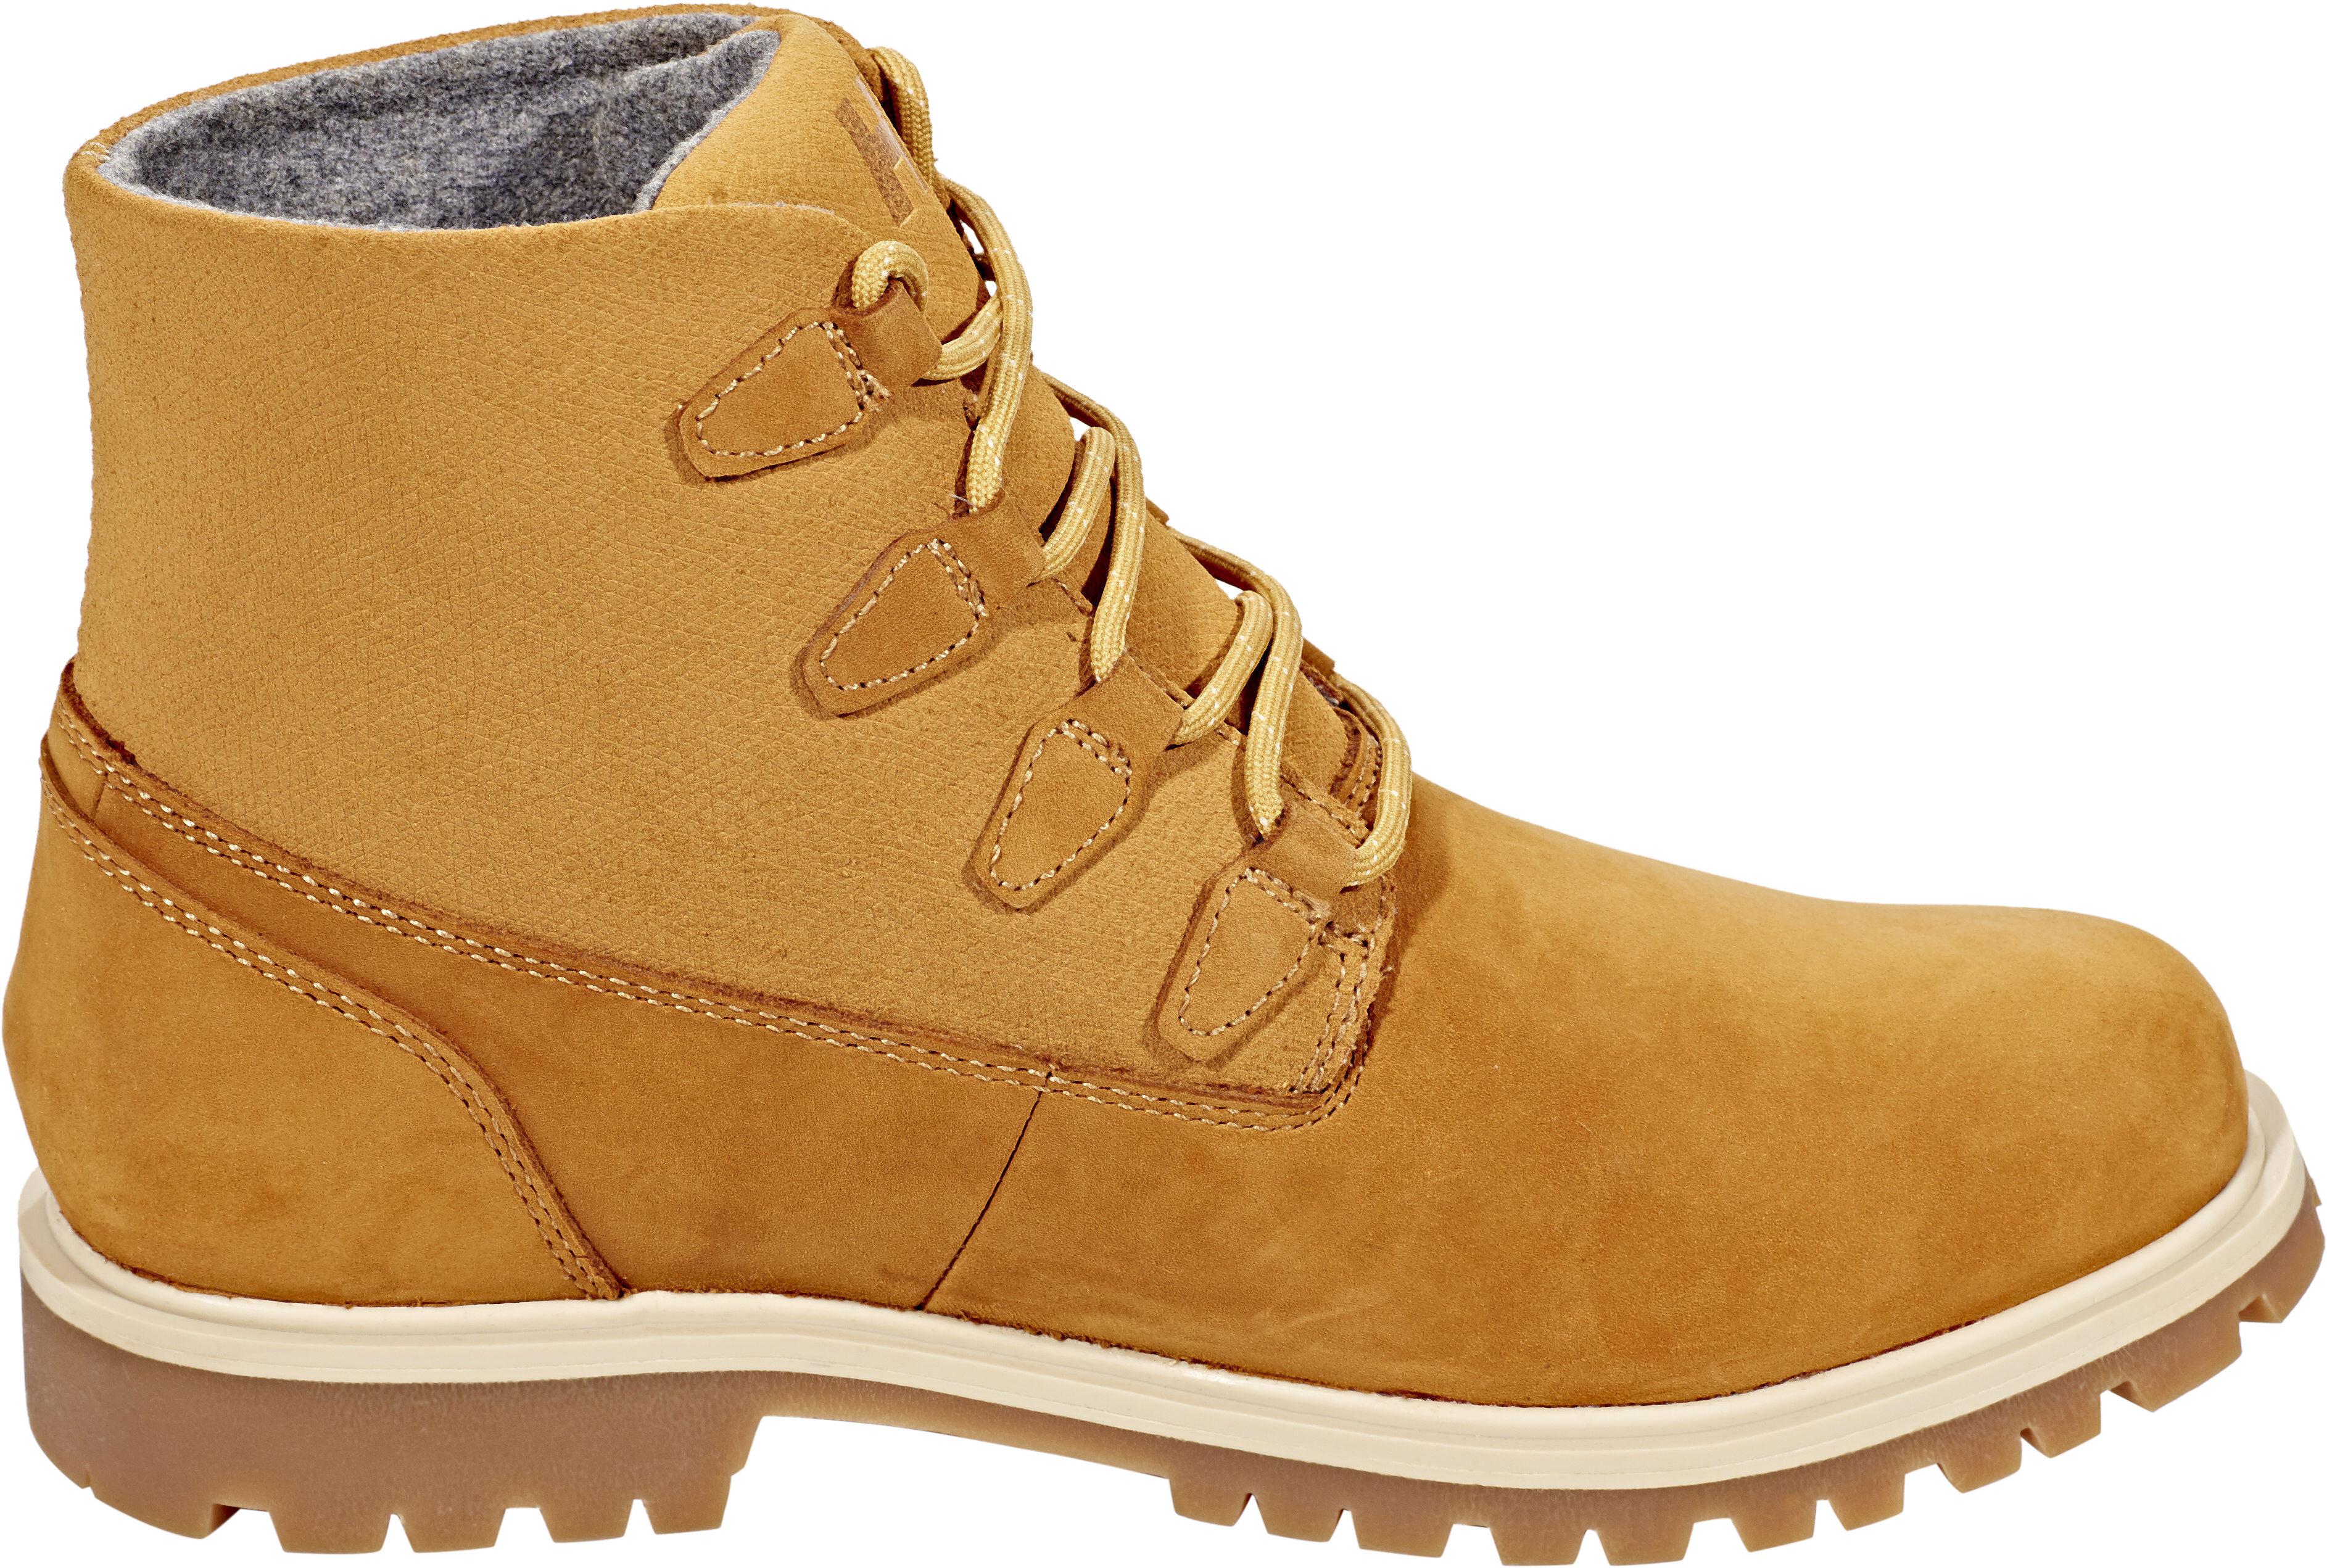 4987f89409140 Helly Hansen Cordova Boots Women honey wheat, oak buff